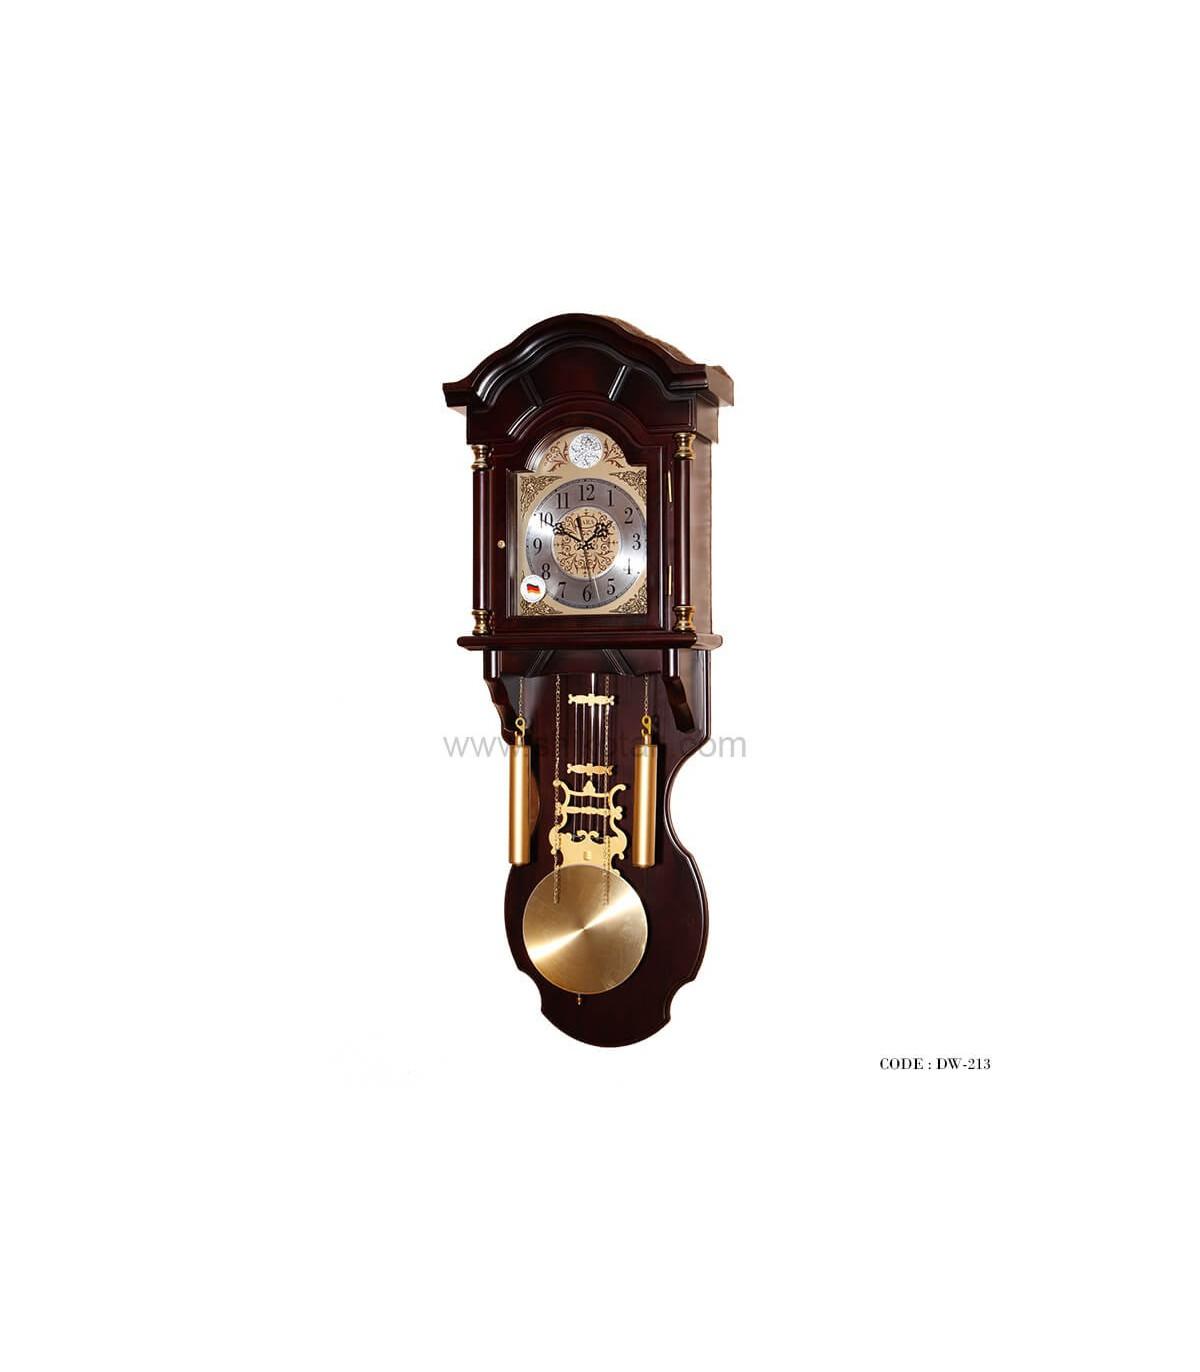 مدل ساعت دیواری پاندول دار کلاسیک سری 213